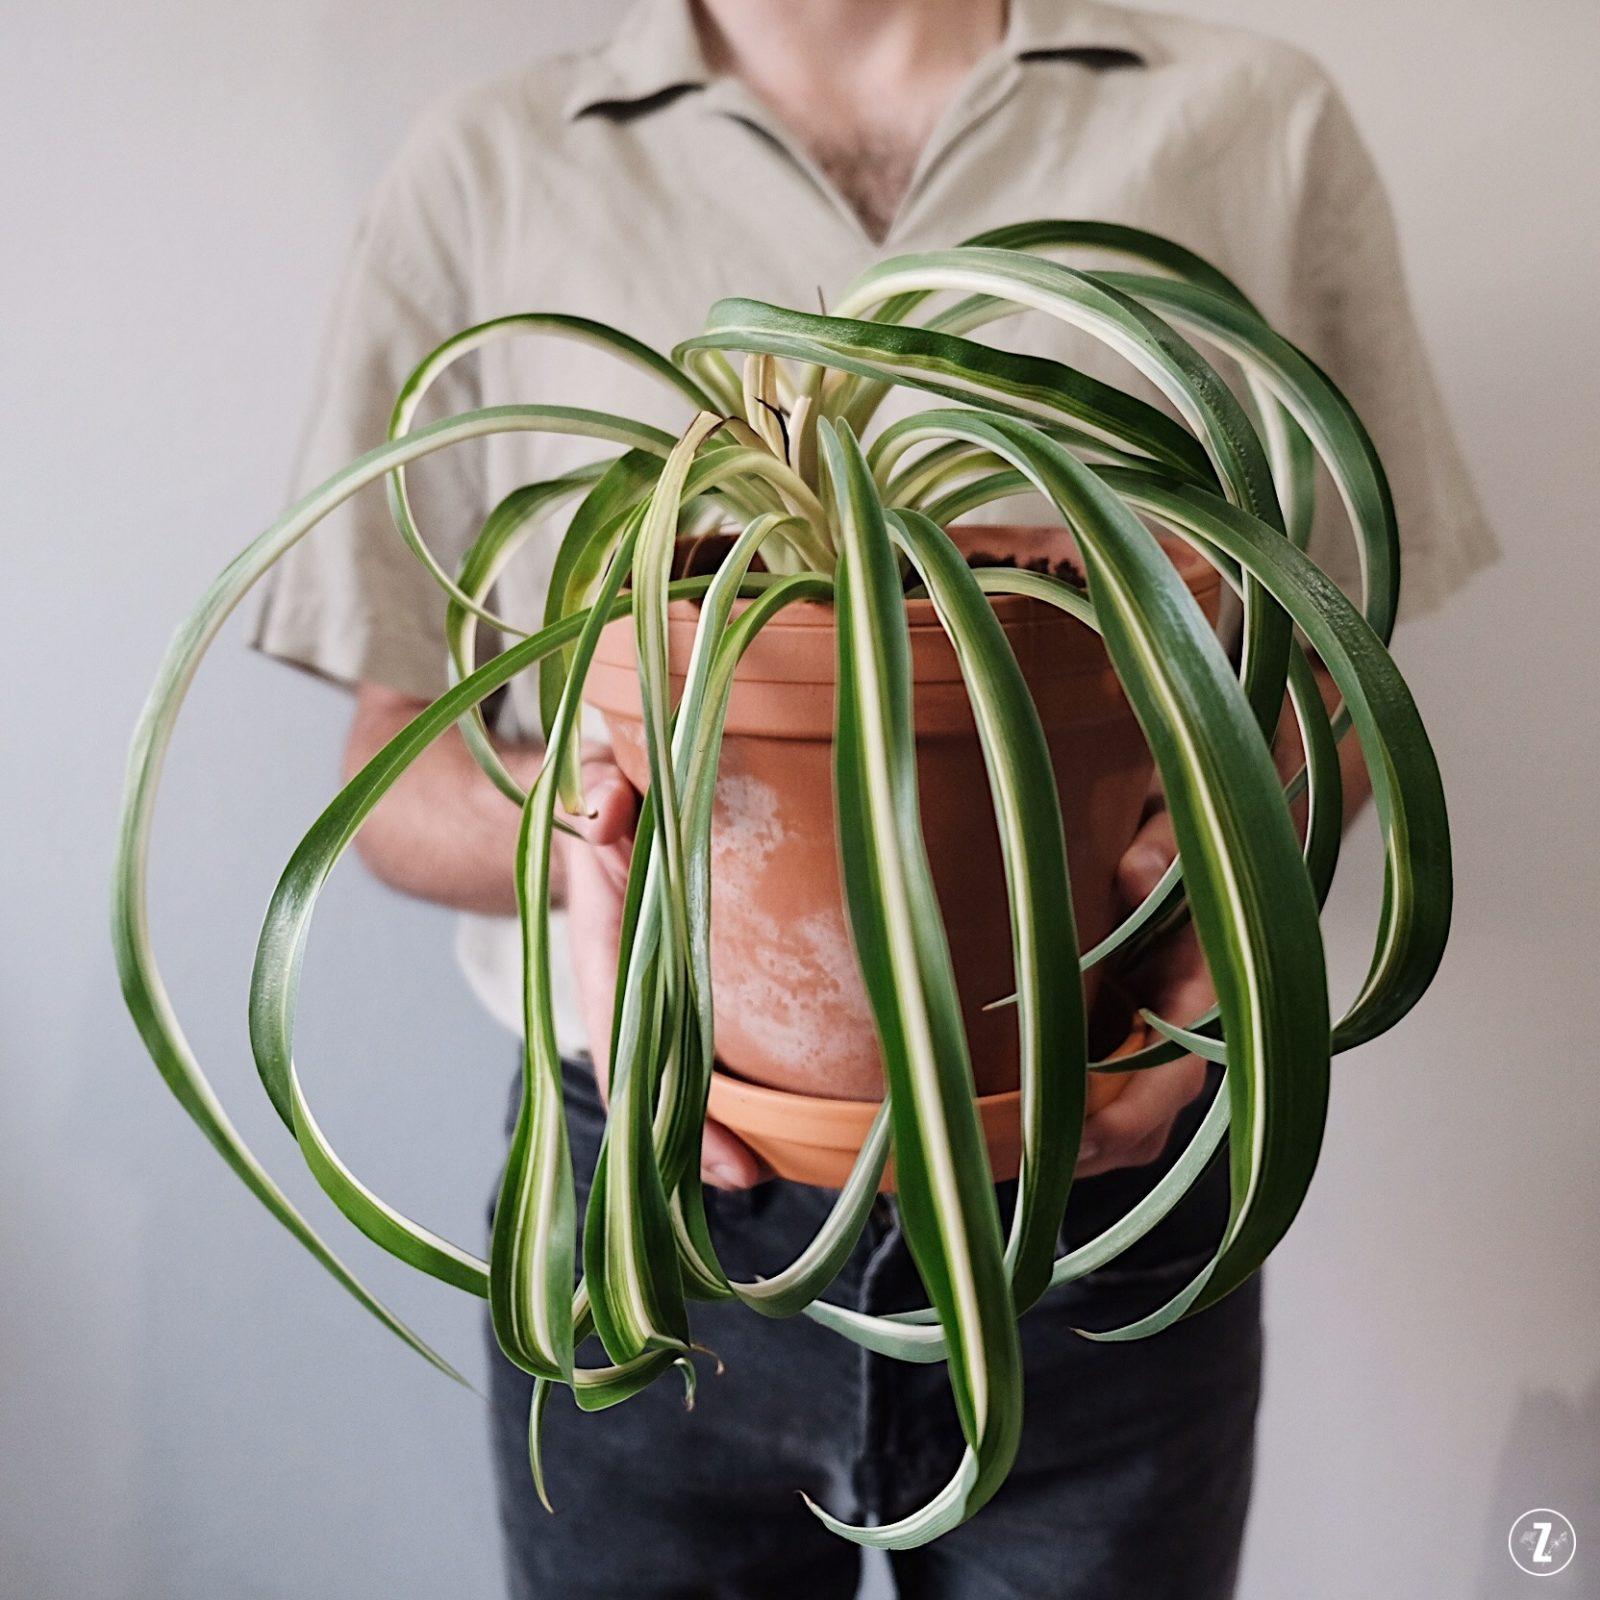 Chlorophytum comosum, adopcja roslin, PictureThis, pierwsza roślina, projekt rosliny, roslinne porady, zielistka sternberga